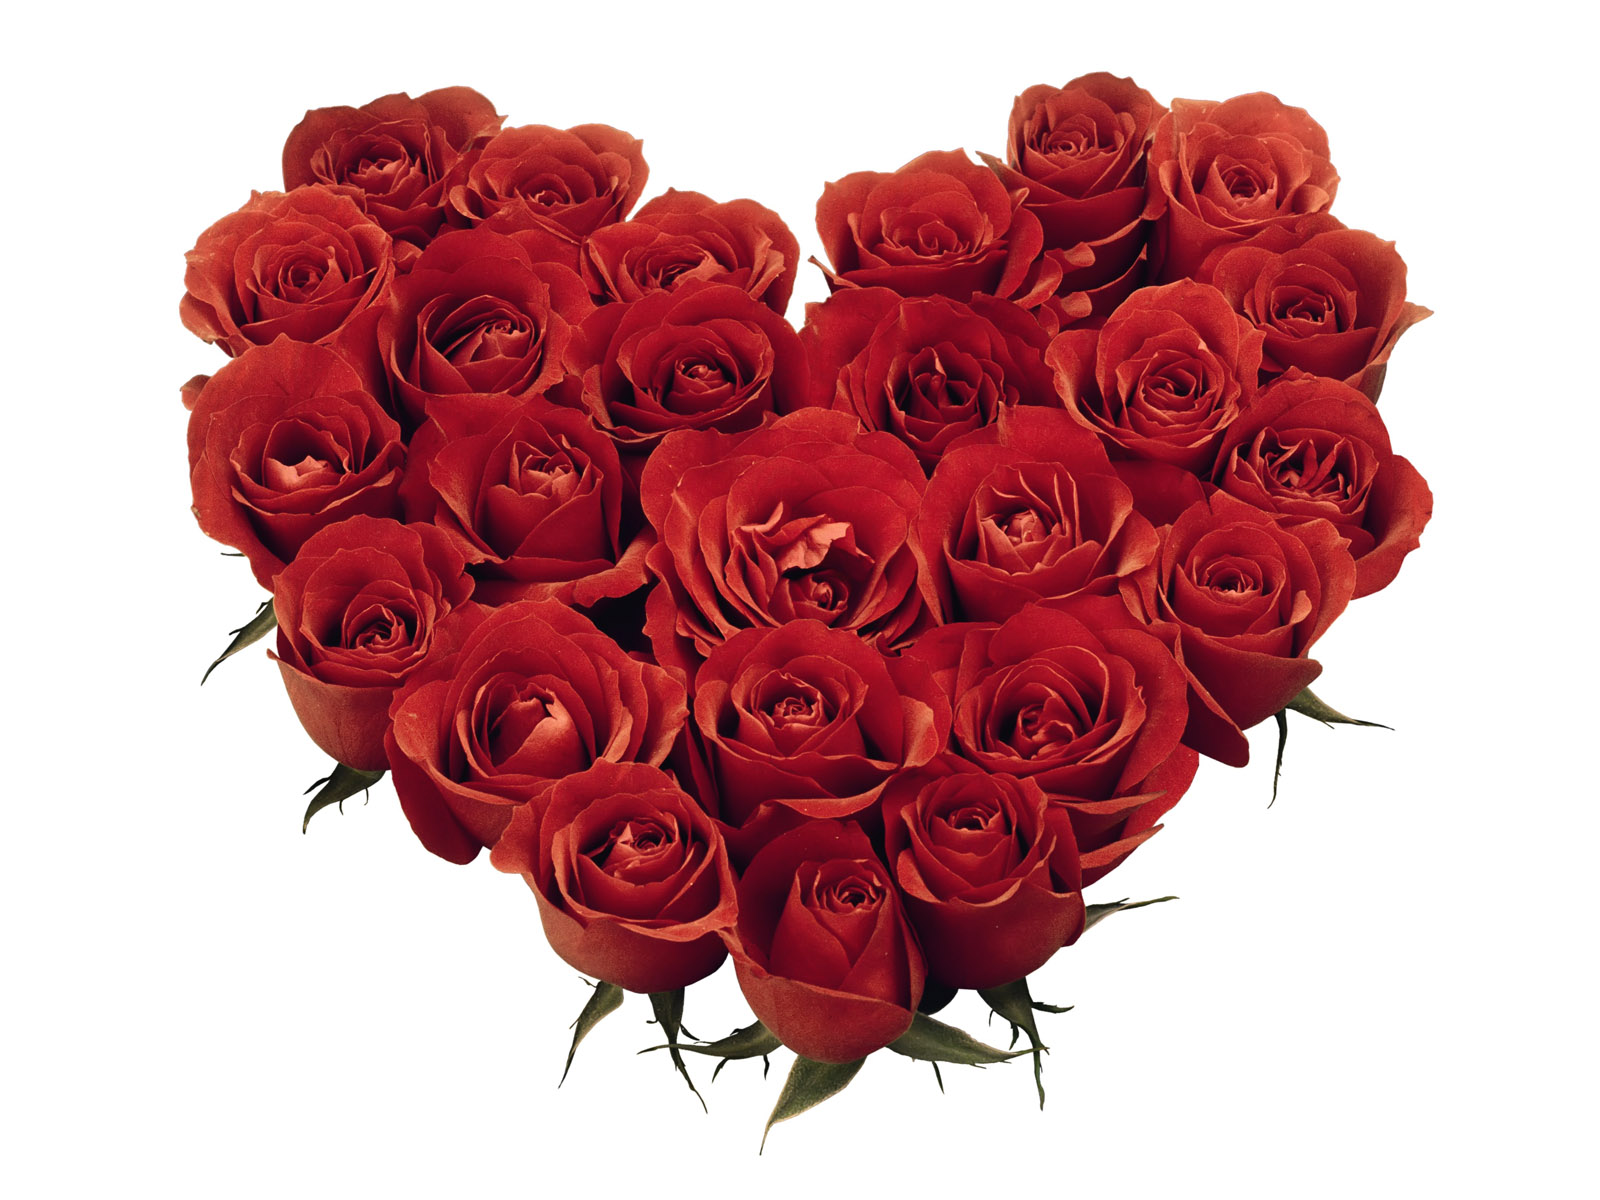 http://1.bp.blogspot.com/-7GpbFRe17JA/TyPZZhRvFFI/AAAAAAAAB2M/7nJBwlydjJU/s1600/Valentines+Day+Wallpaper+5.jpg